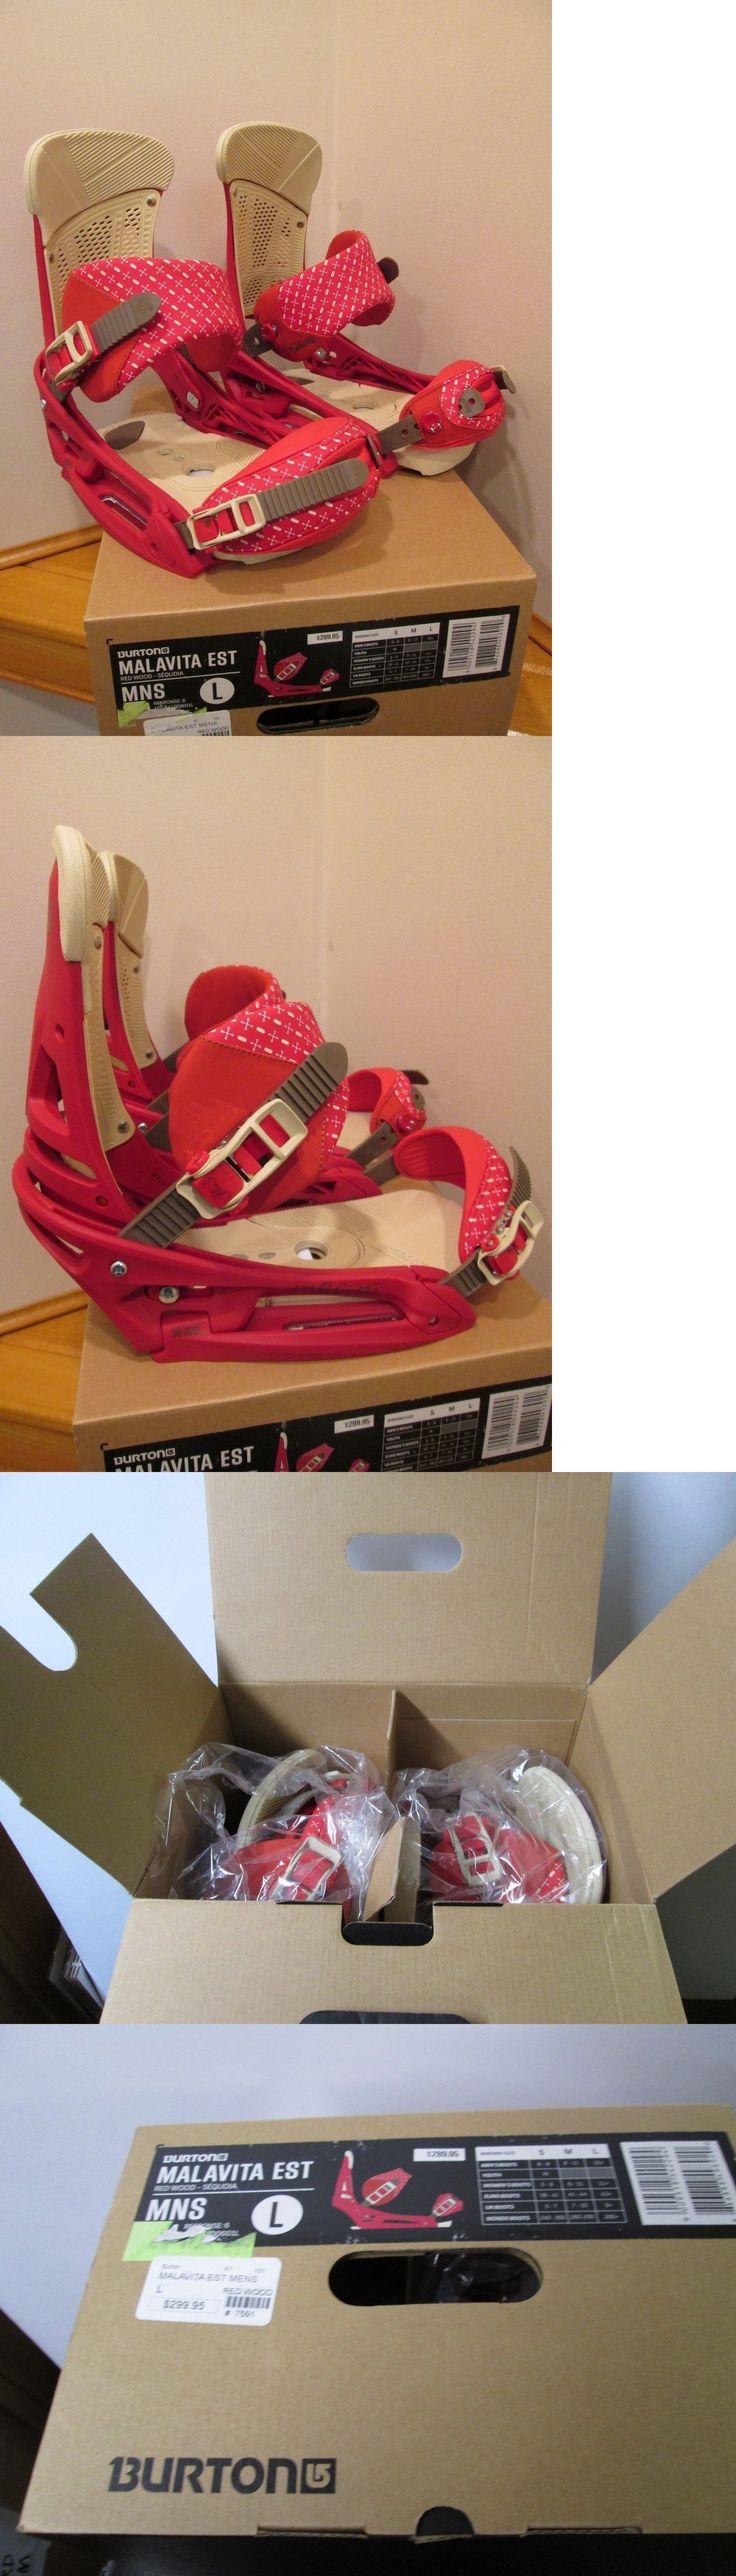 Bindings 21248: Burton Malavita Est Snowboard Bindings New In Box! Large -> BUY IT NOW ONLY: $159.0 on eBay!